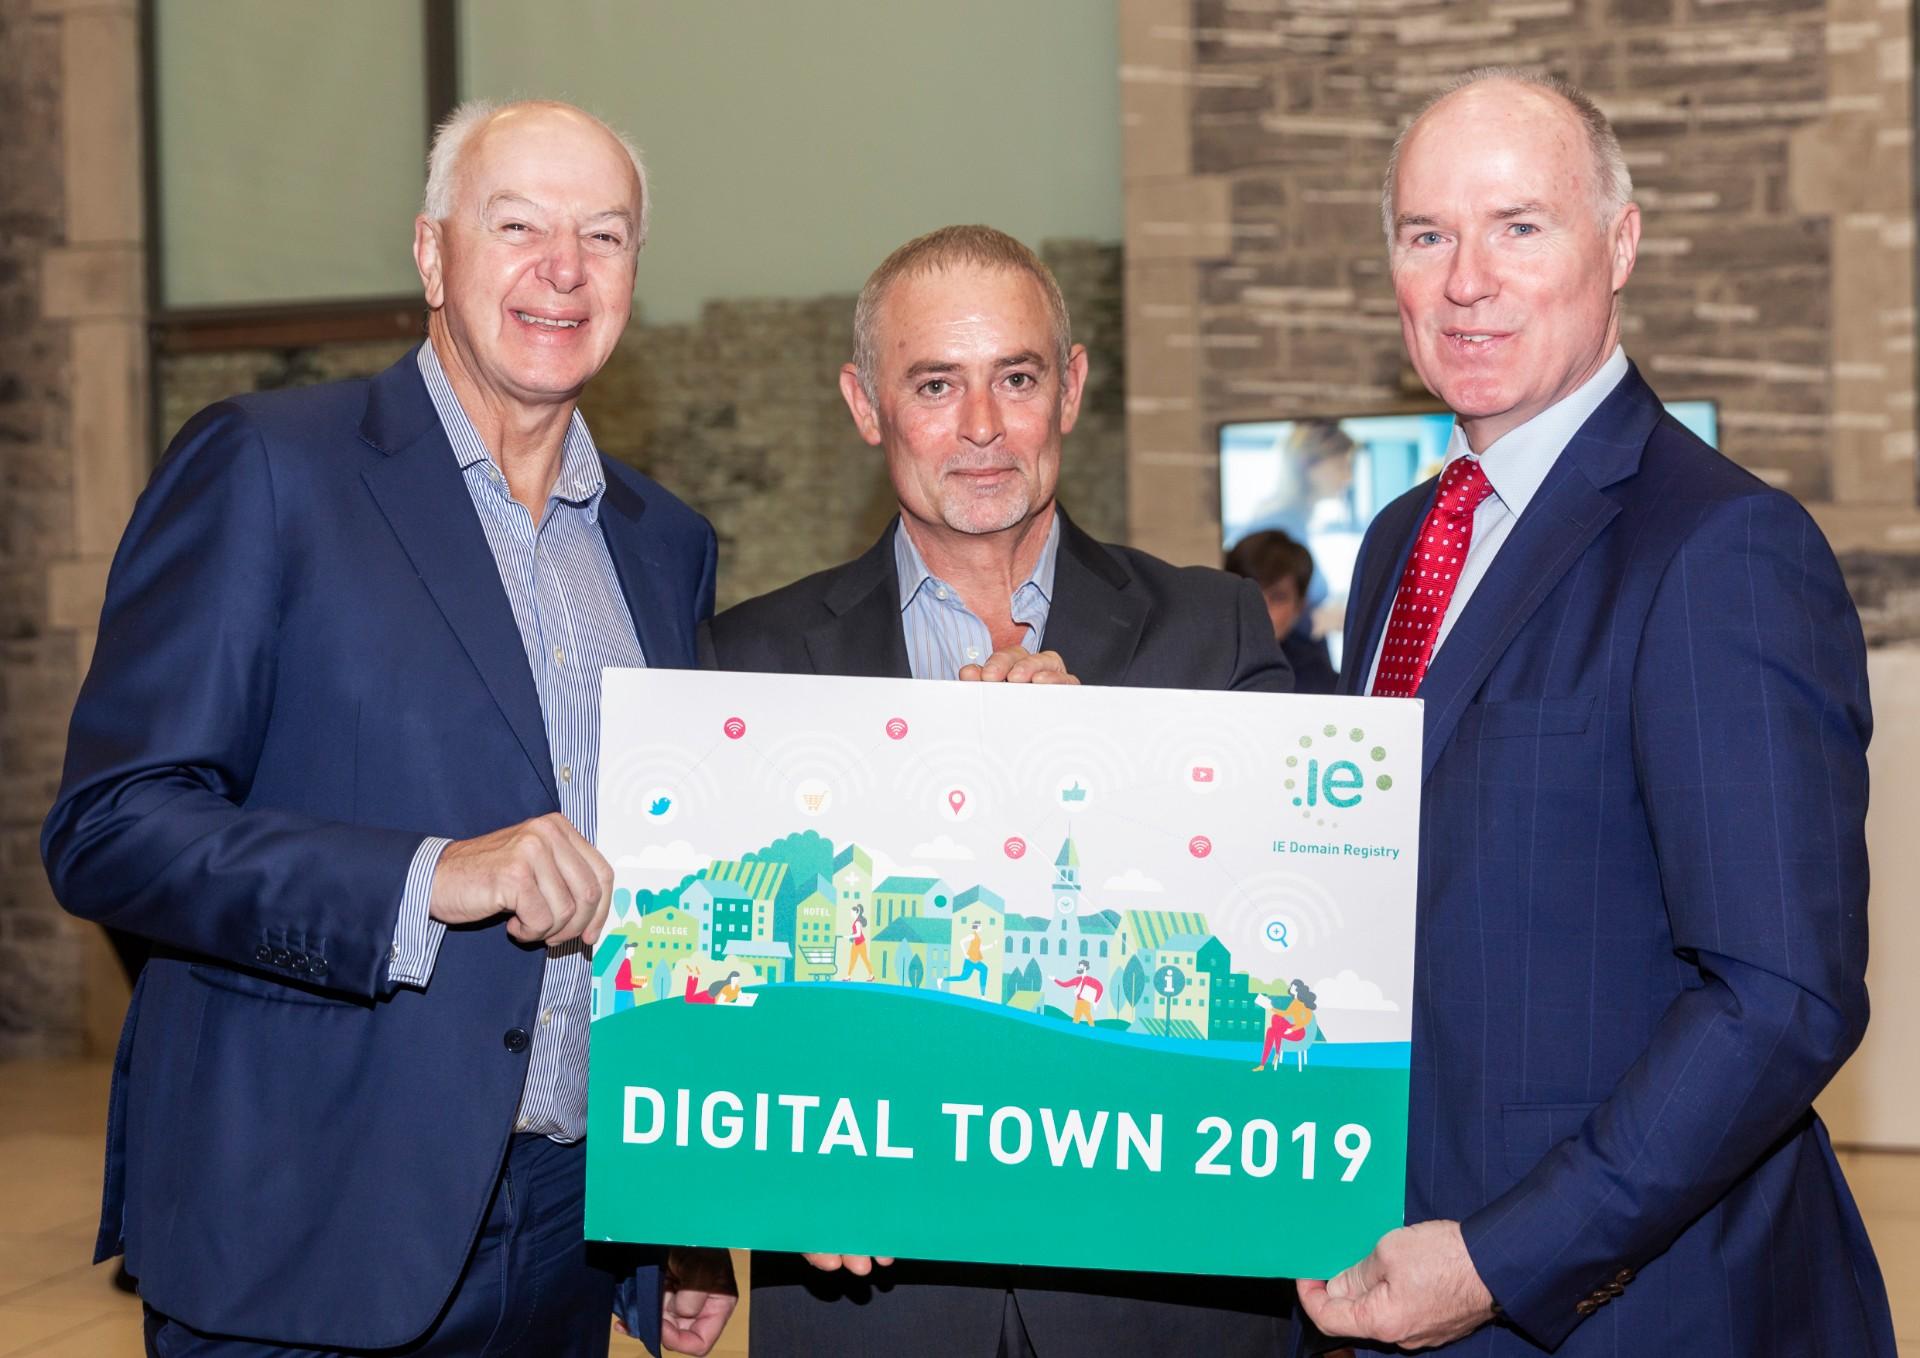 Bobby Kerr, Phil Prentice and David Curtin at Digital Town Sligo (Closing Ceremony)